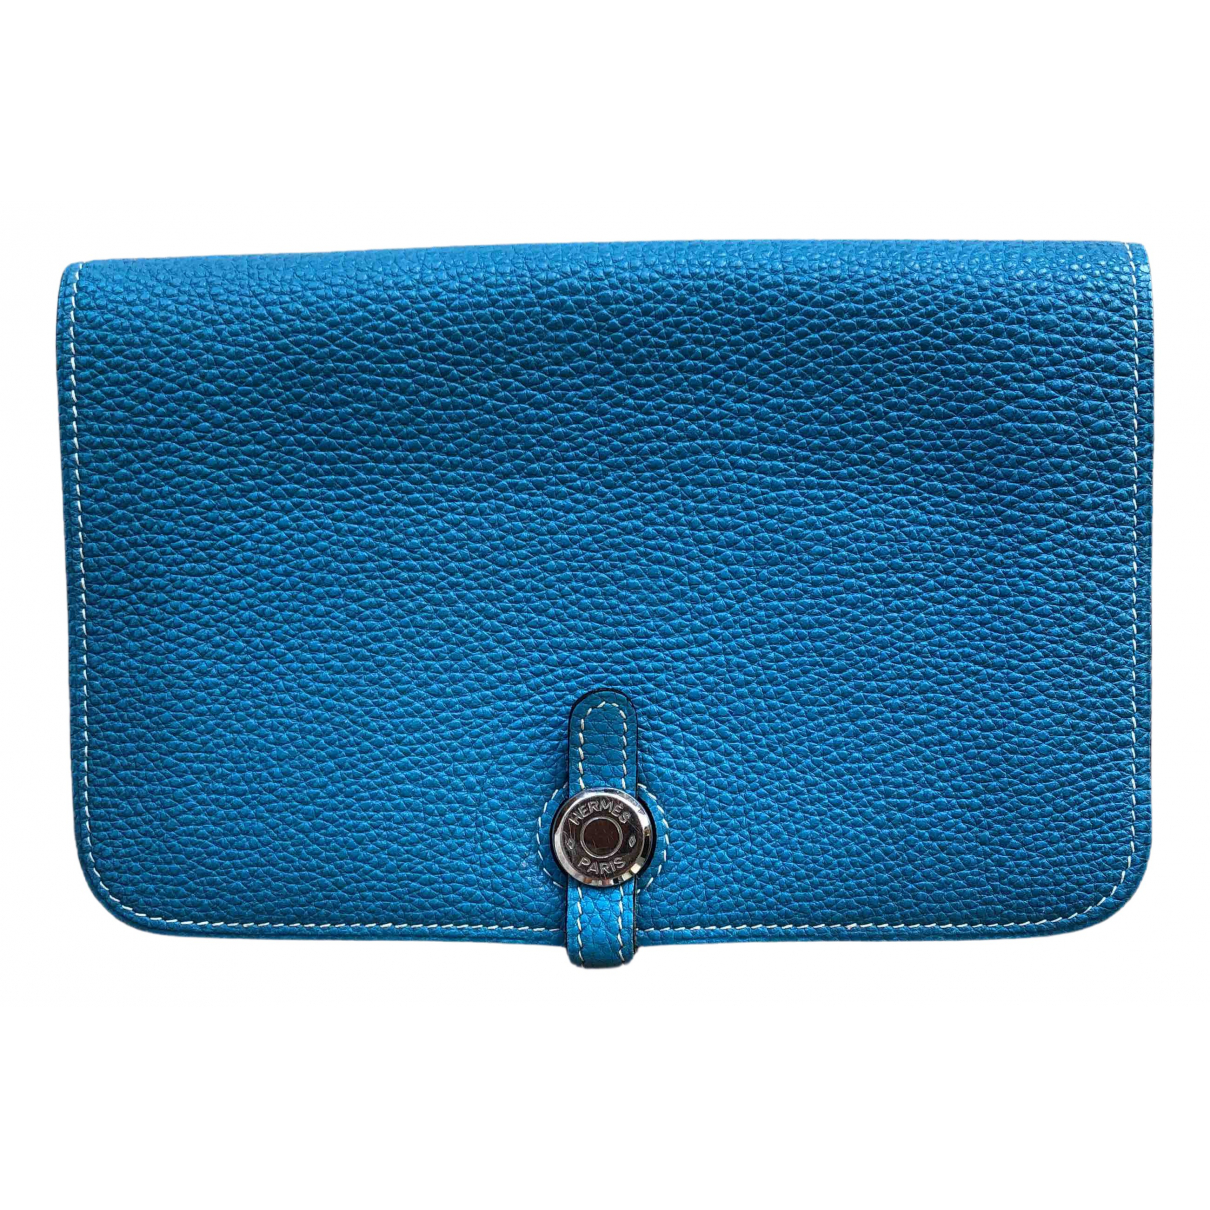 Hermès Dogon Blue Leather wallet for Women N